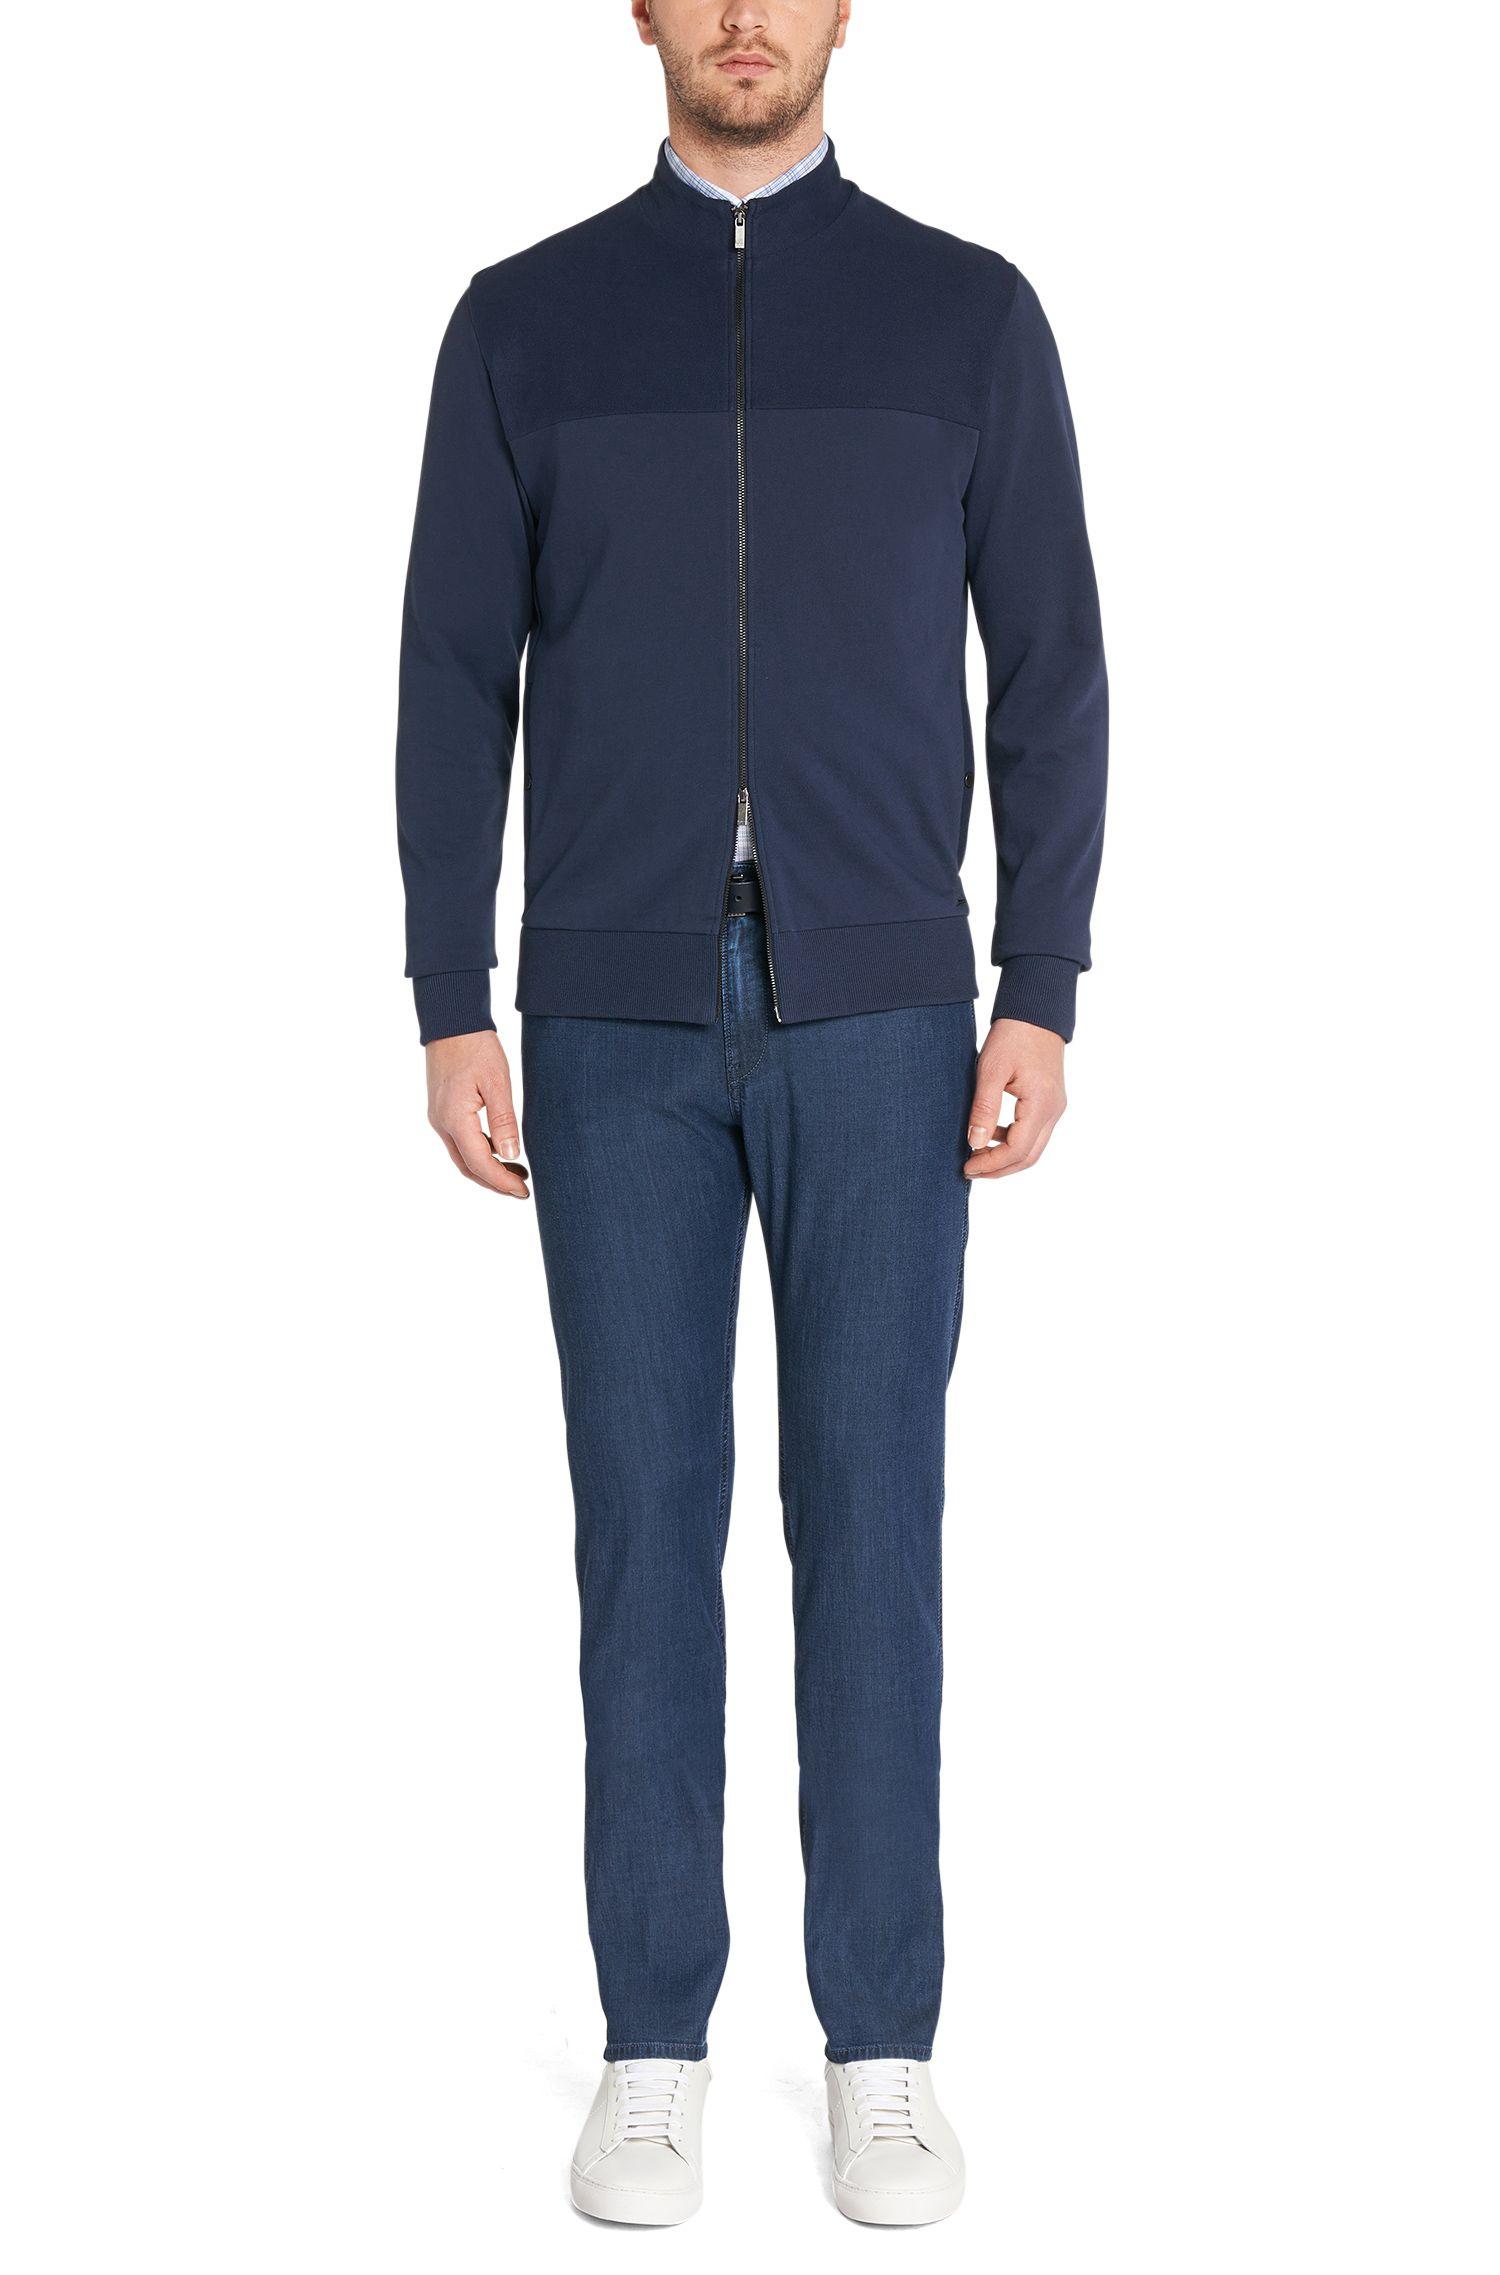 'Delaware' | Slim Fit, 6.5 oz Stretch Cotton Blend Jeans